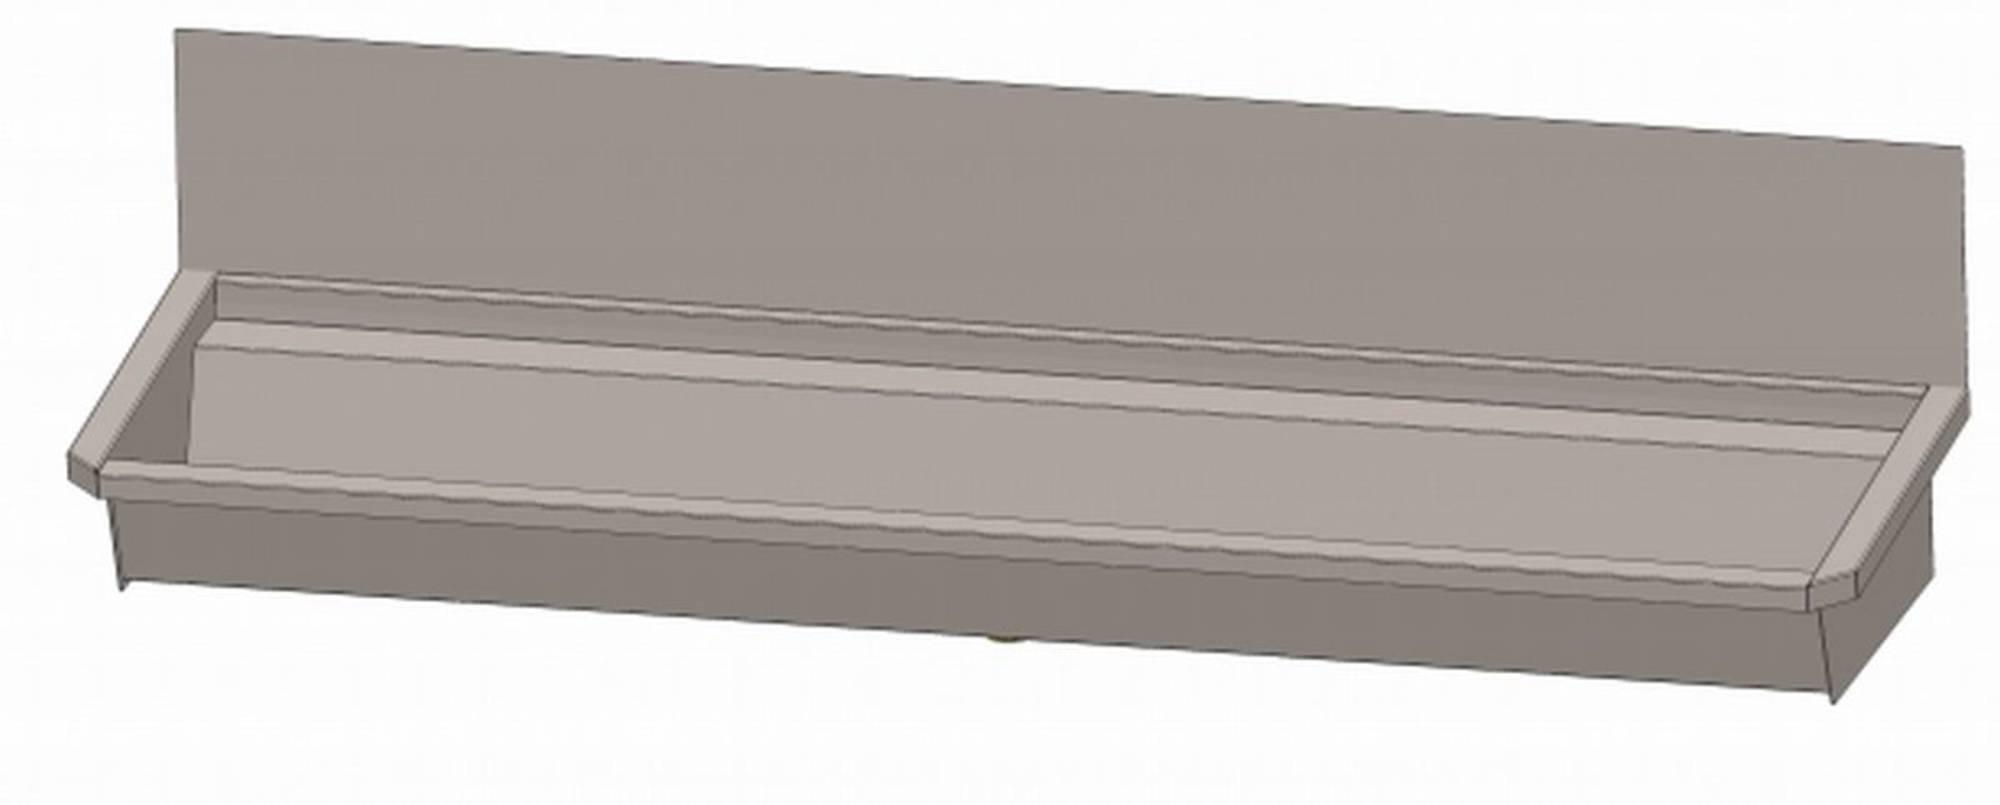 INTERSAN SANILAV wasgoot met spatbord 180 cm.3 pers. zonder leiding INOX 304 (303Z1)